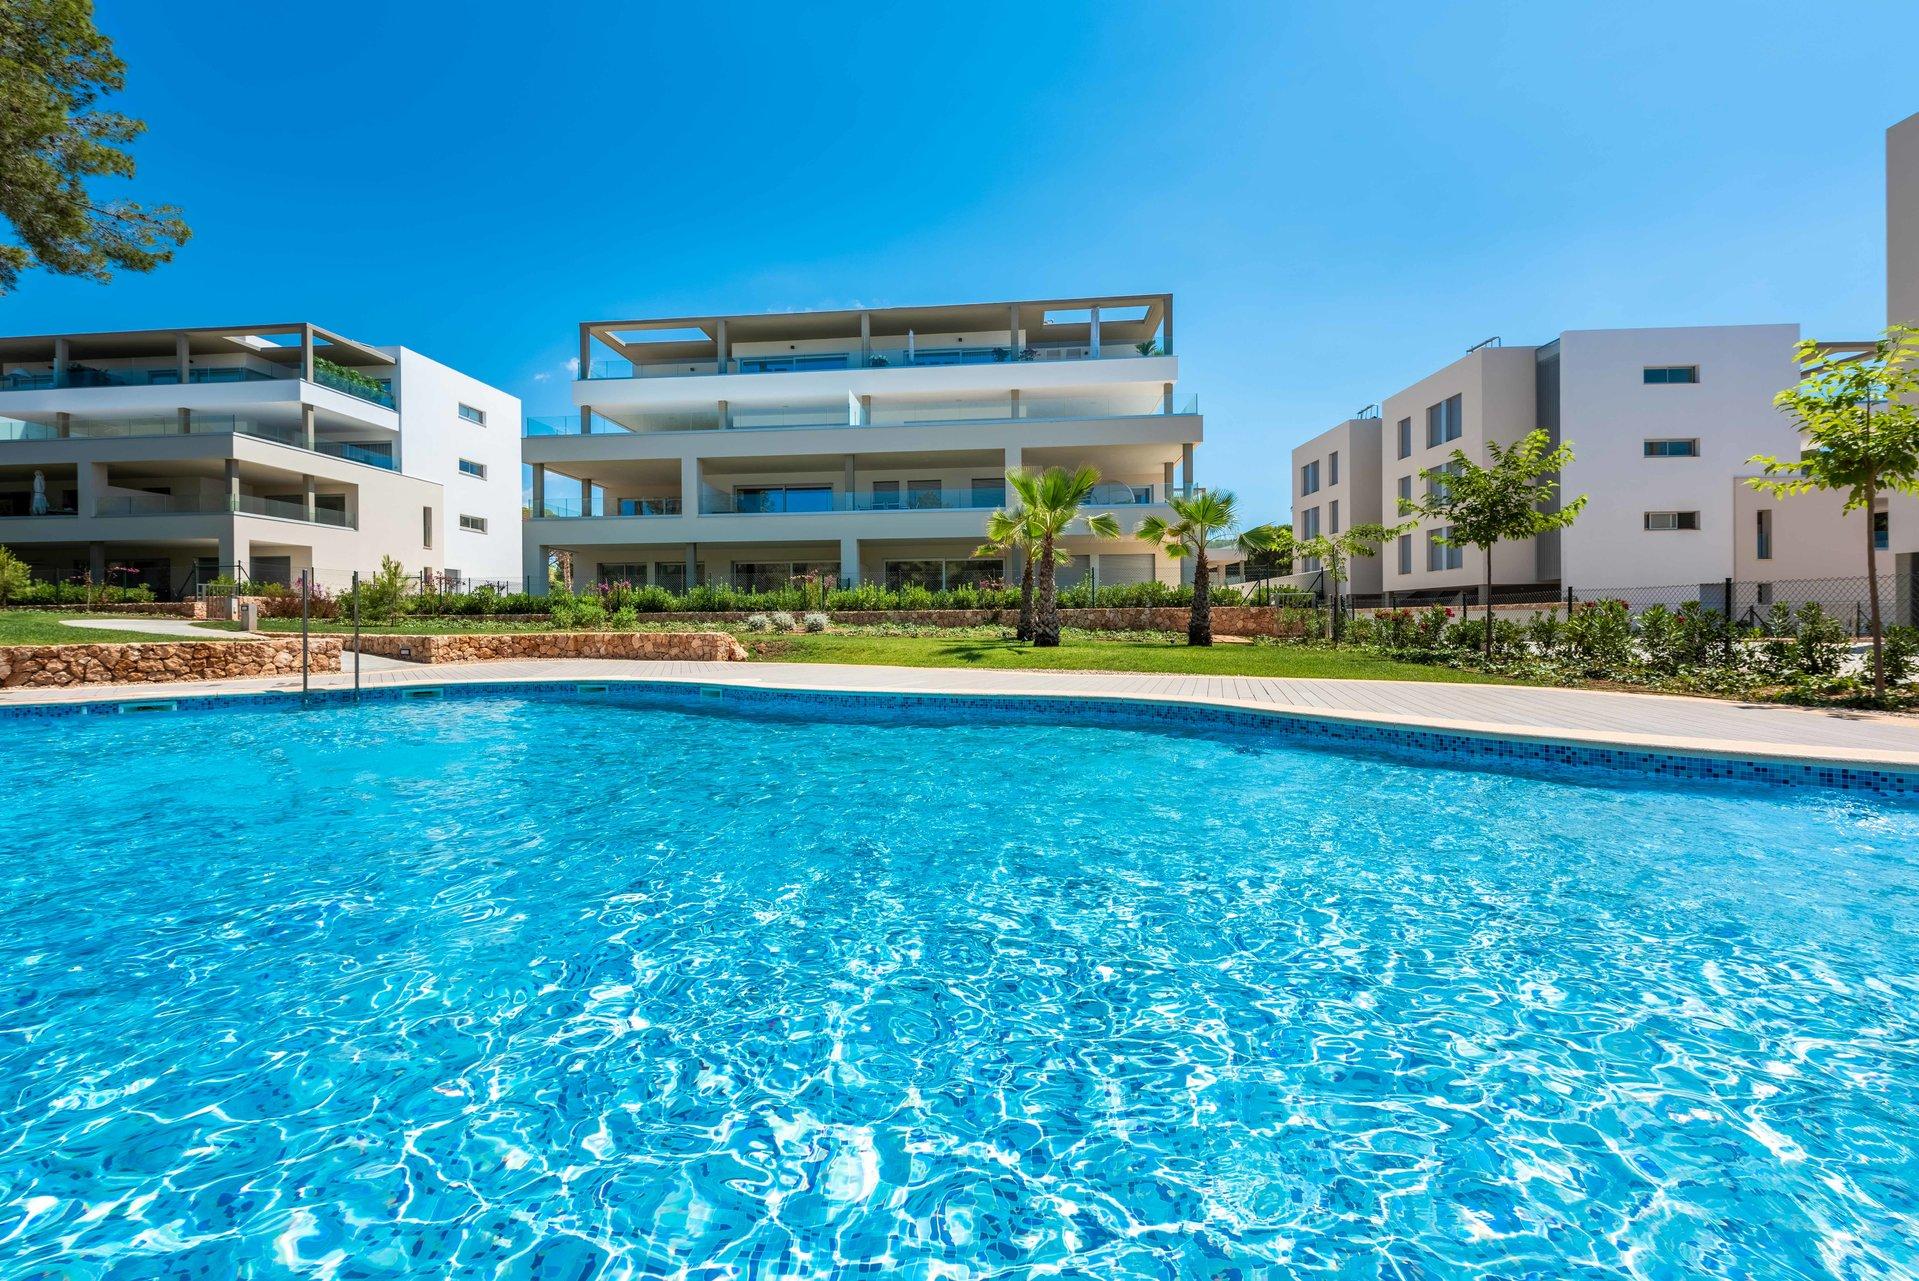 Ad Sale Apartment Santa Ponsa (07180) ref:V0406SP